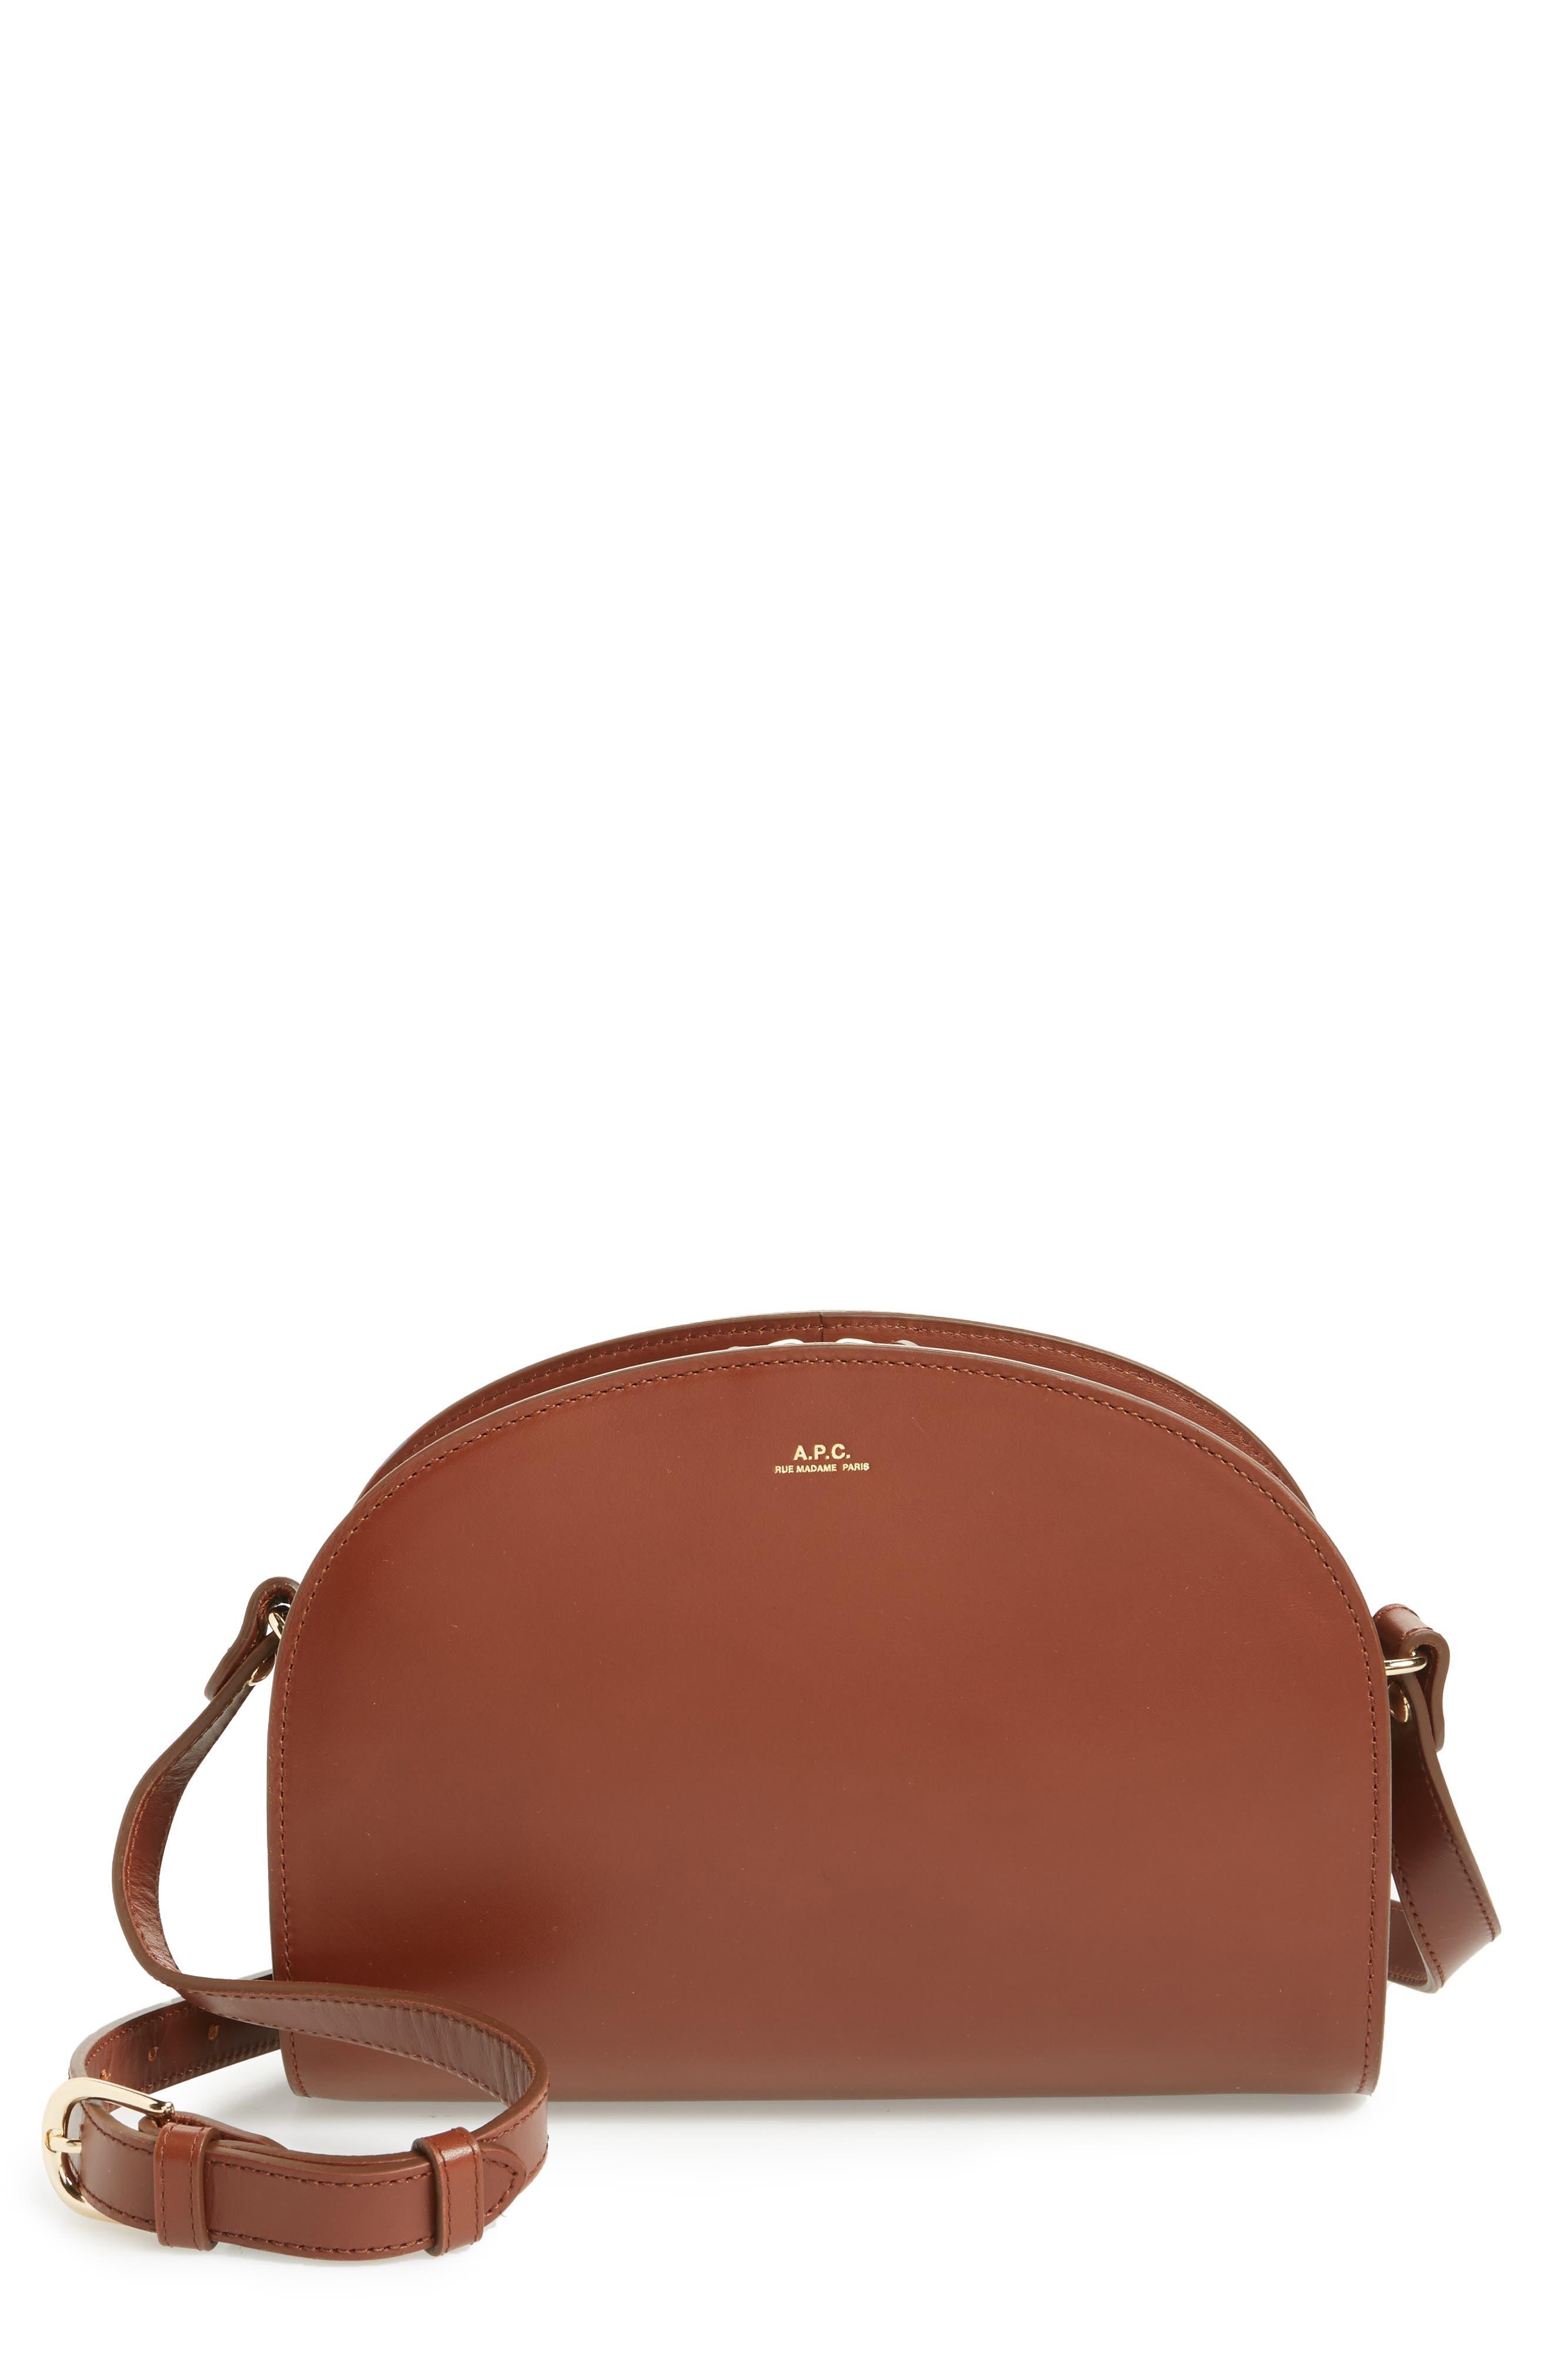 'Sac Demi Lune' Leather Crossbody Bag,                             Main thumbnail 1, color,                             NOISETTE